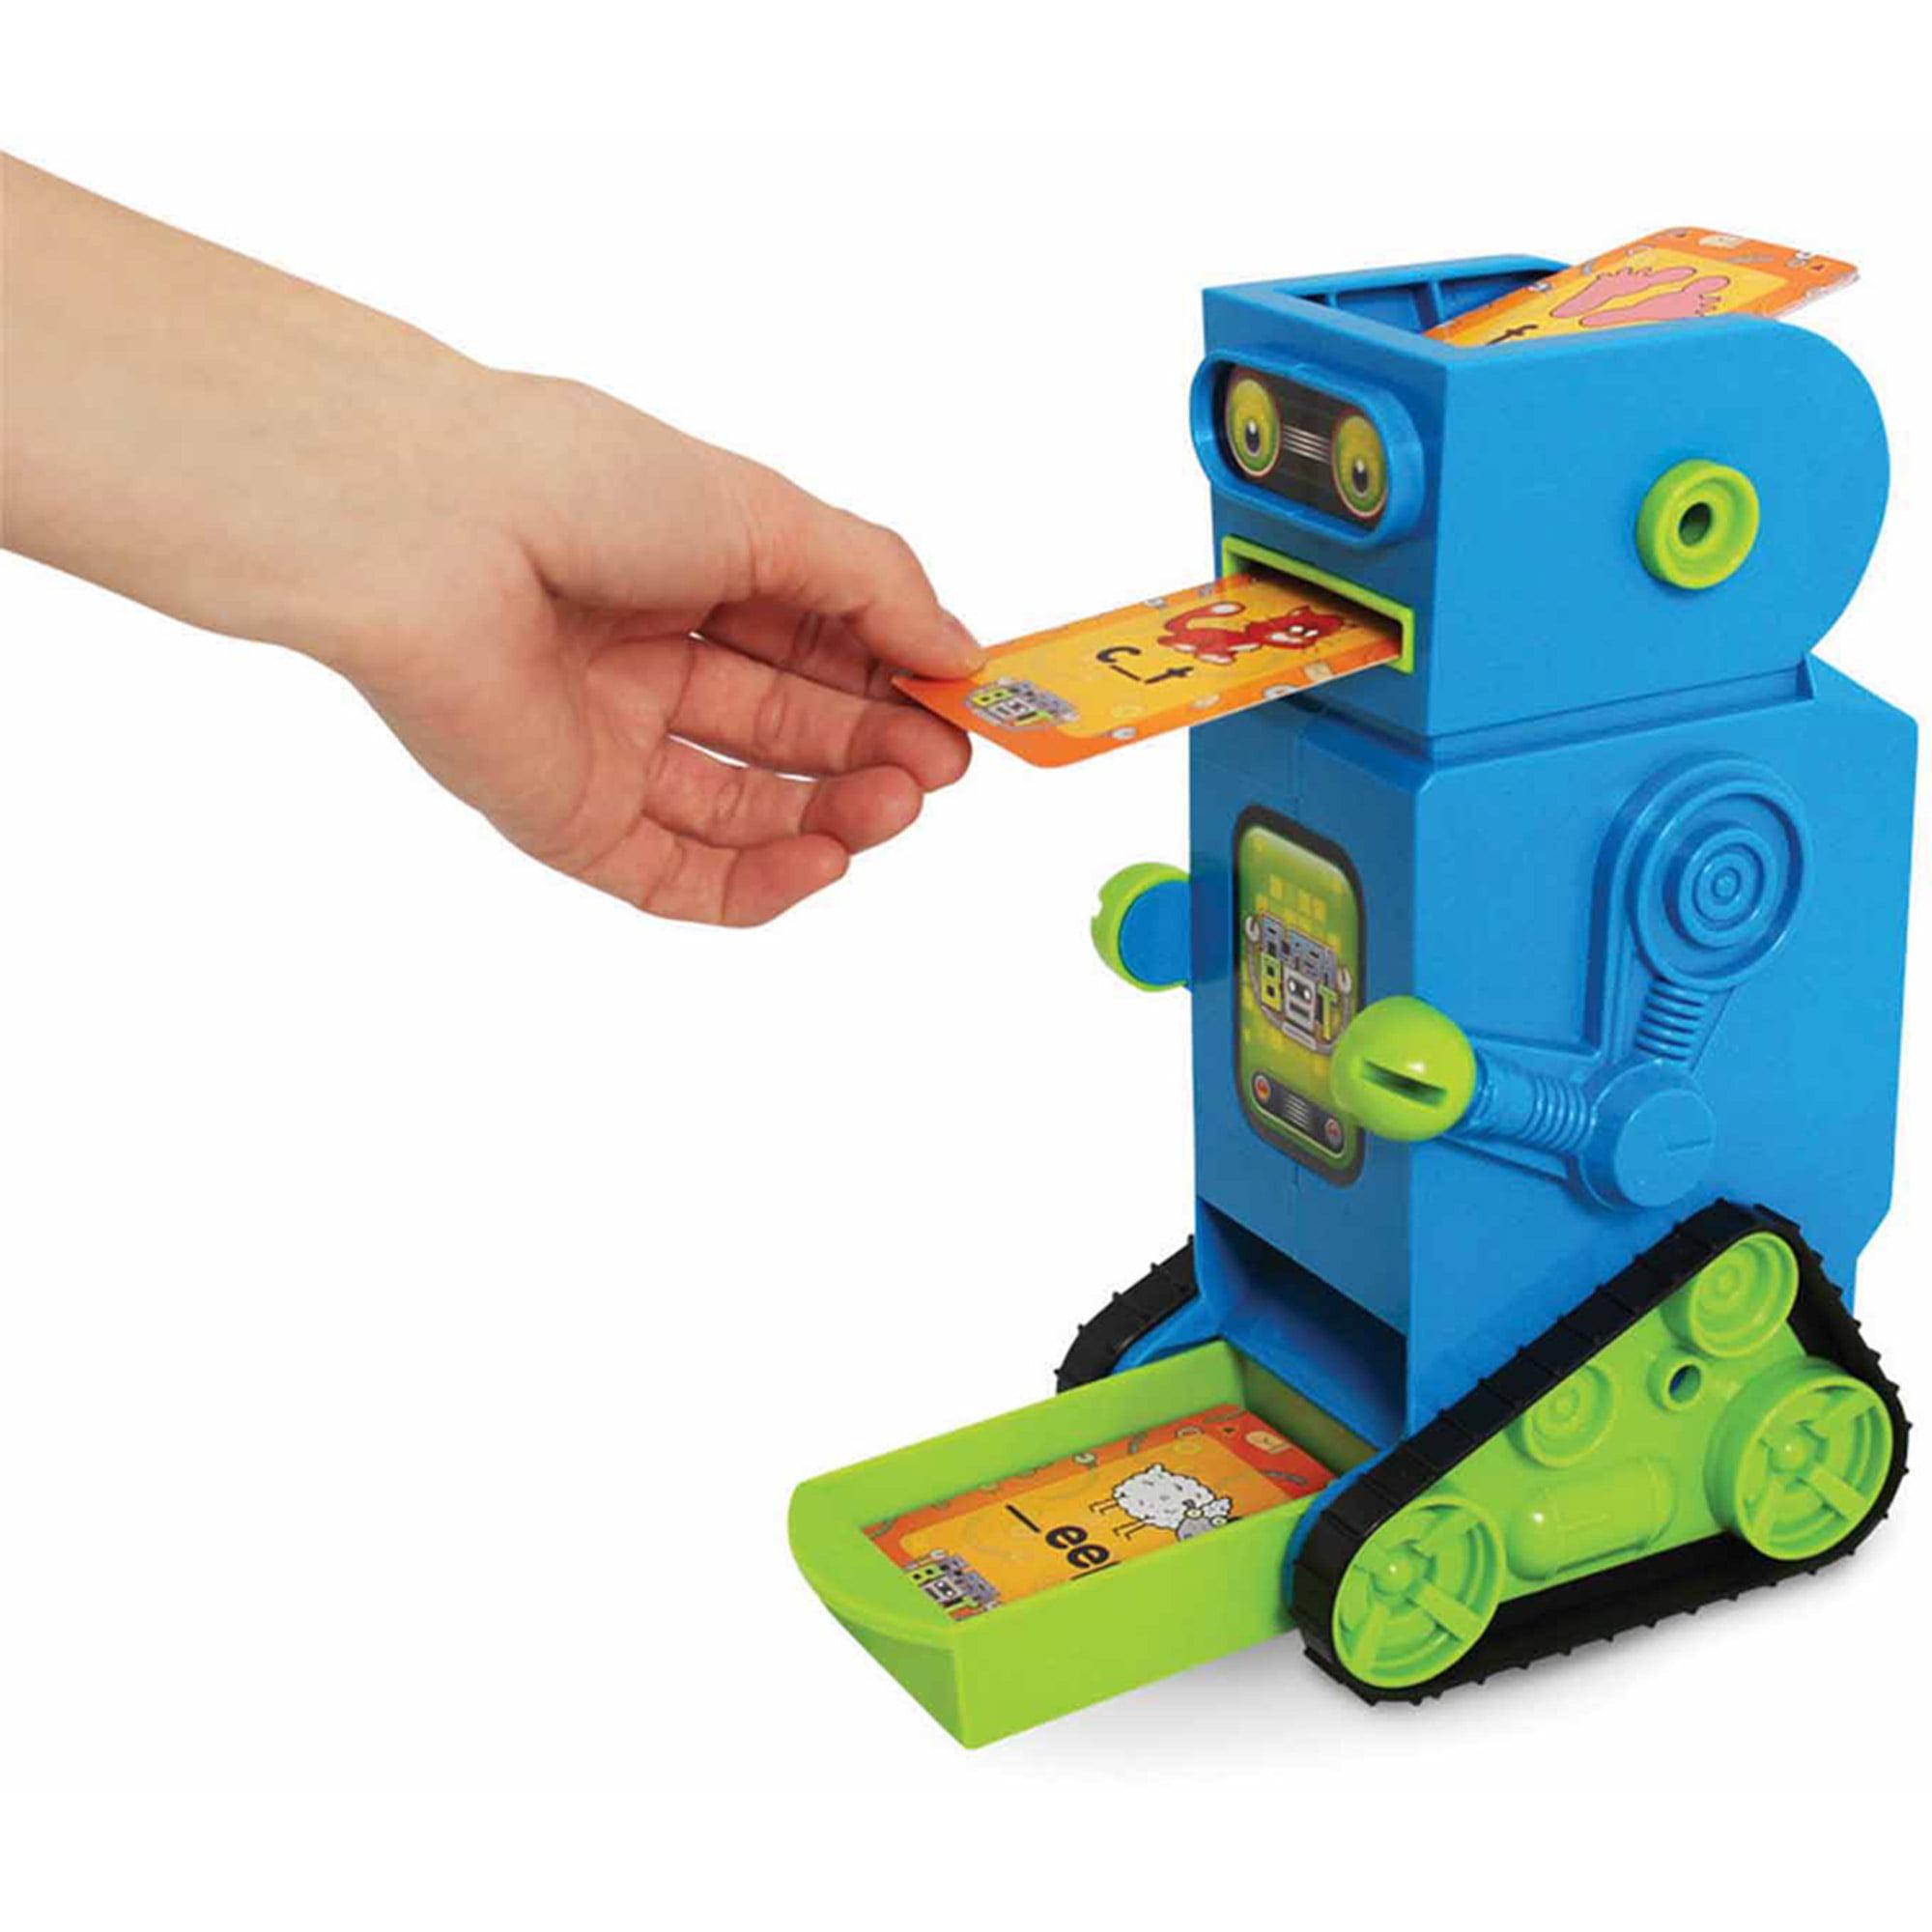 Junior Learning Flashbot Flash Card Robot, Includes 20 Demonstration Flash Cards